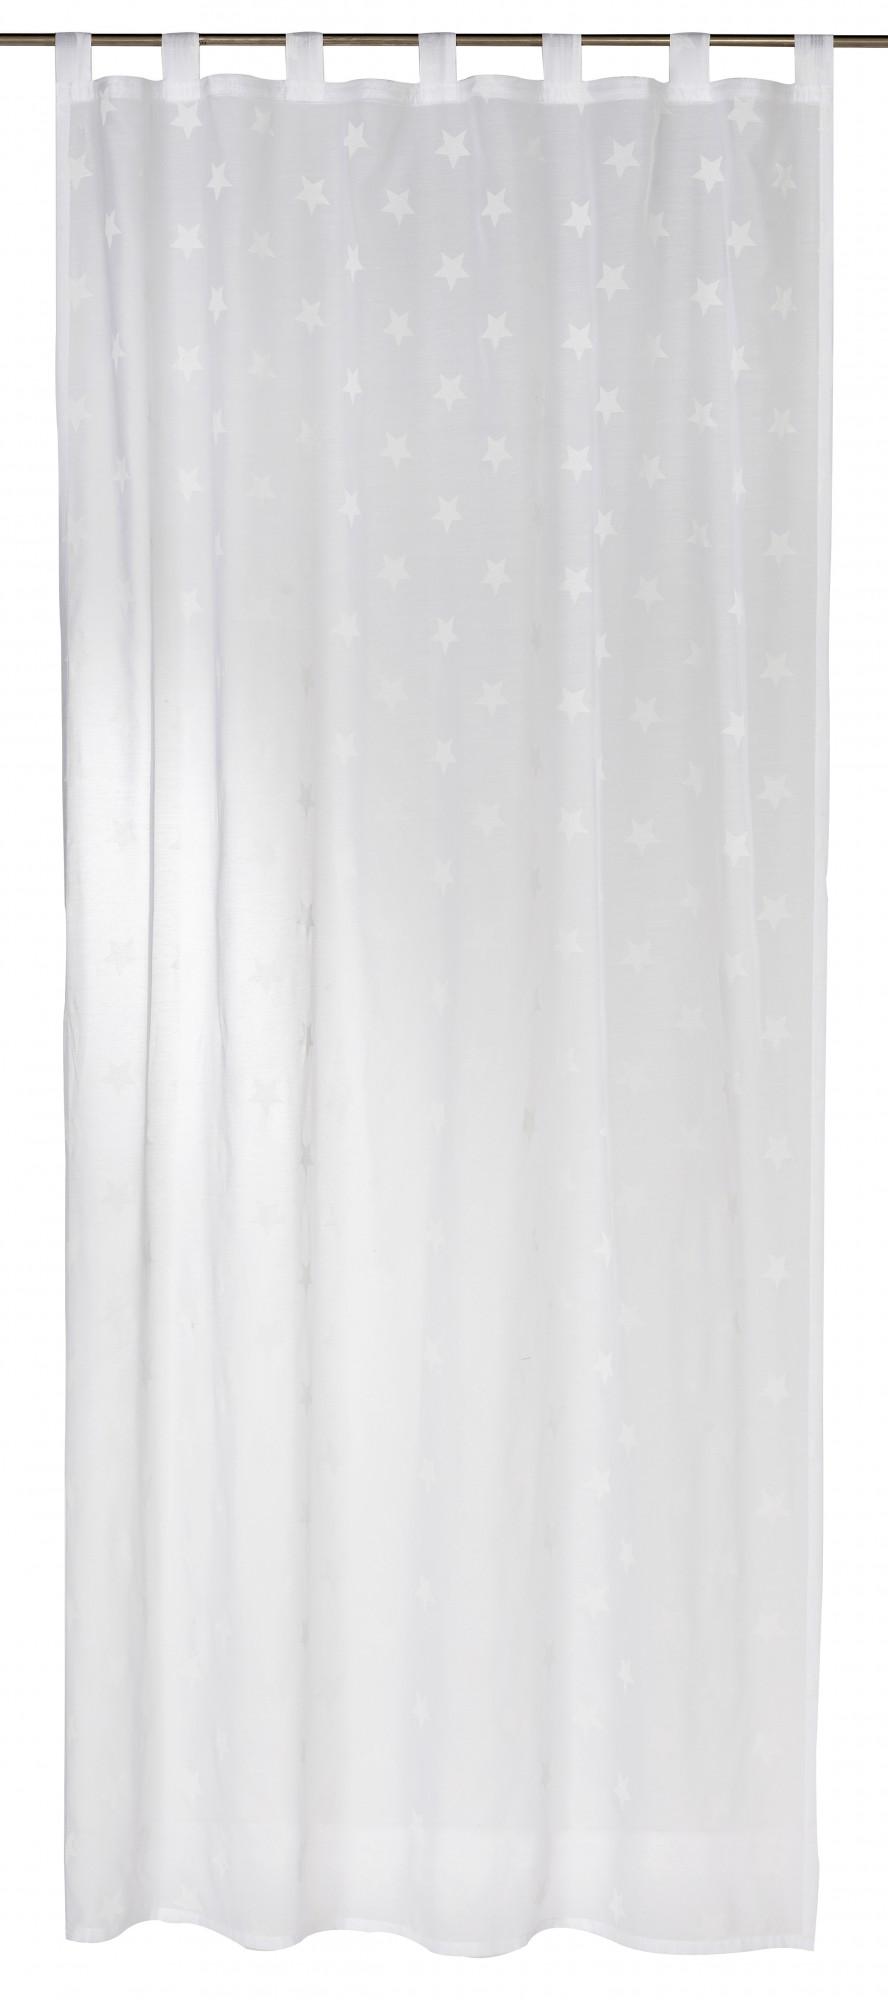 schlaufenschal halbtransparent wei 140x255cm 197476 ebay. Black Bedroom Furniture Sets. Home Design Ideas